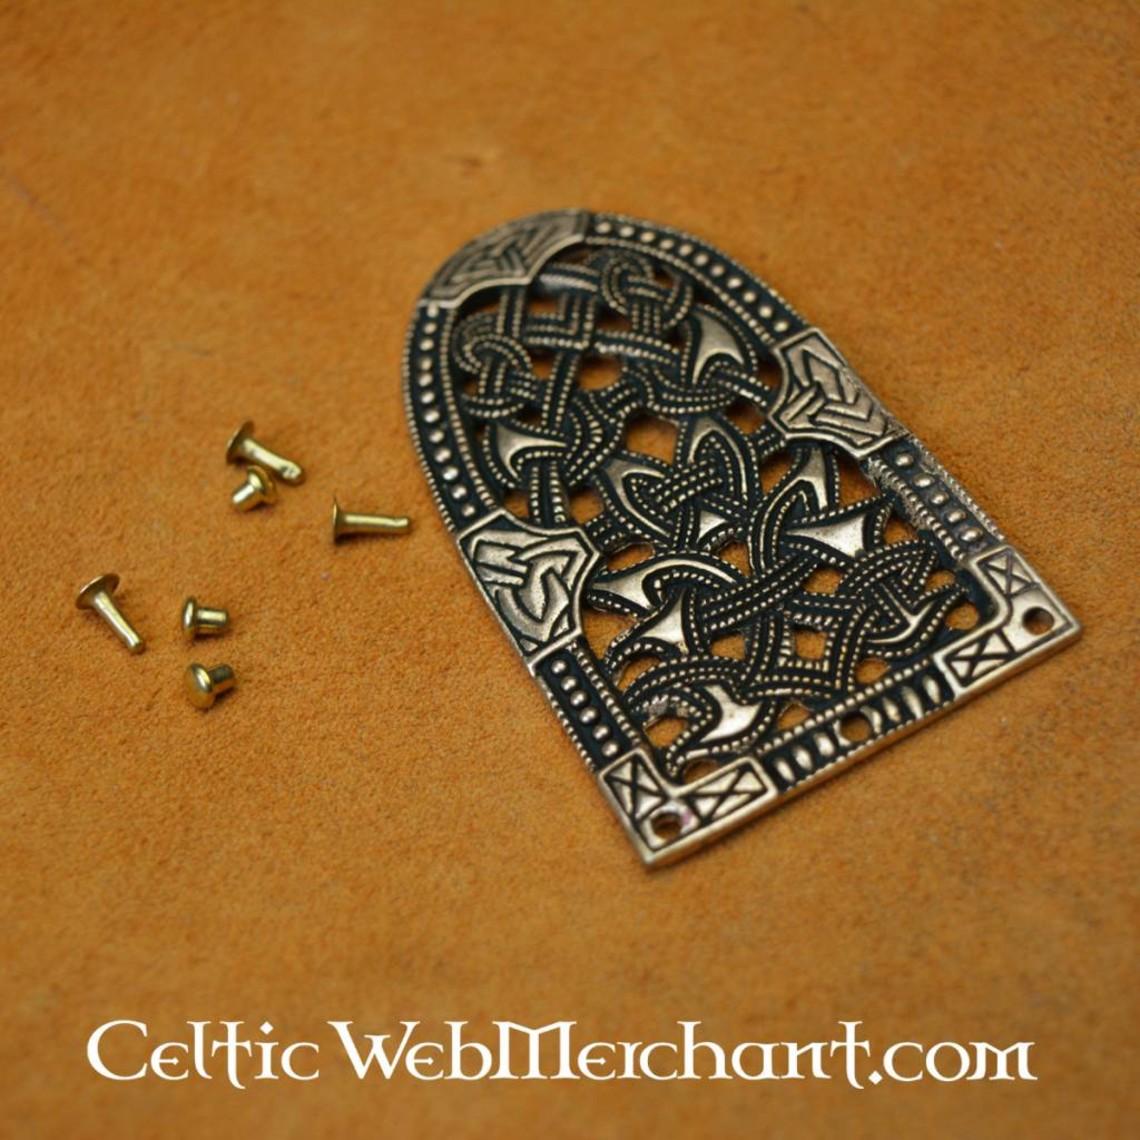 Gokstad riembeslag brons